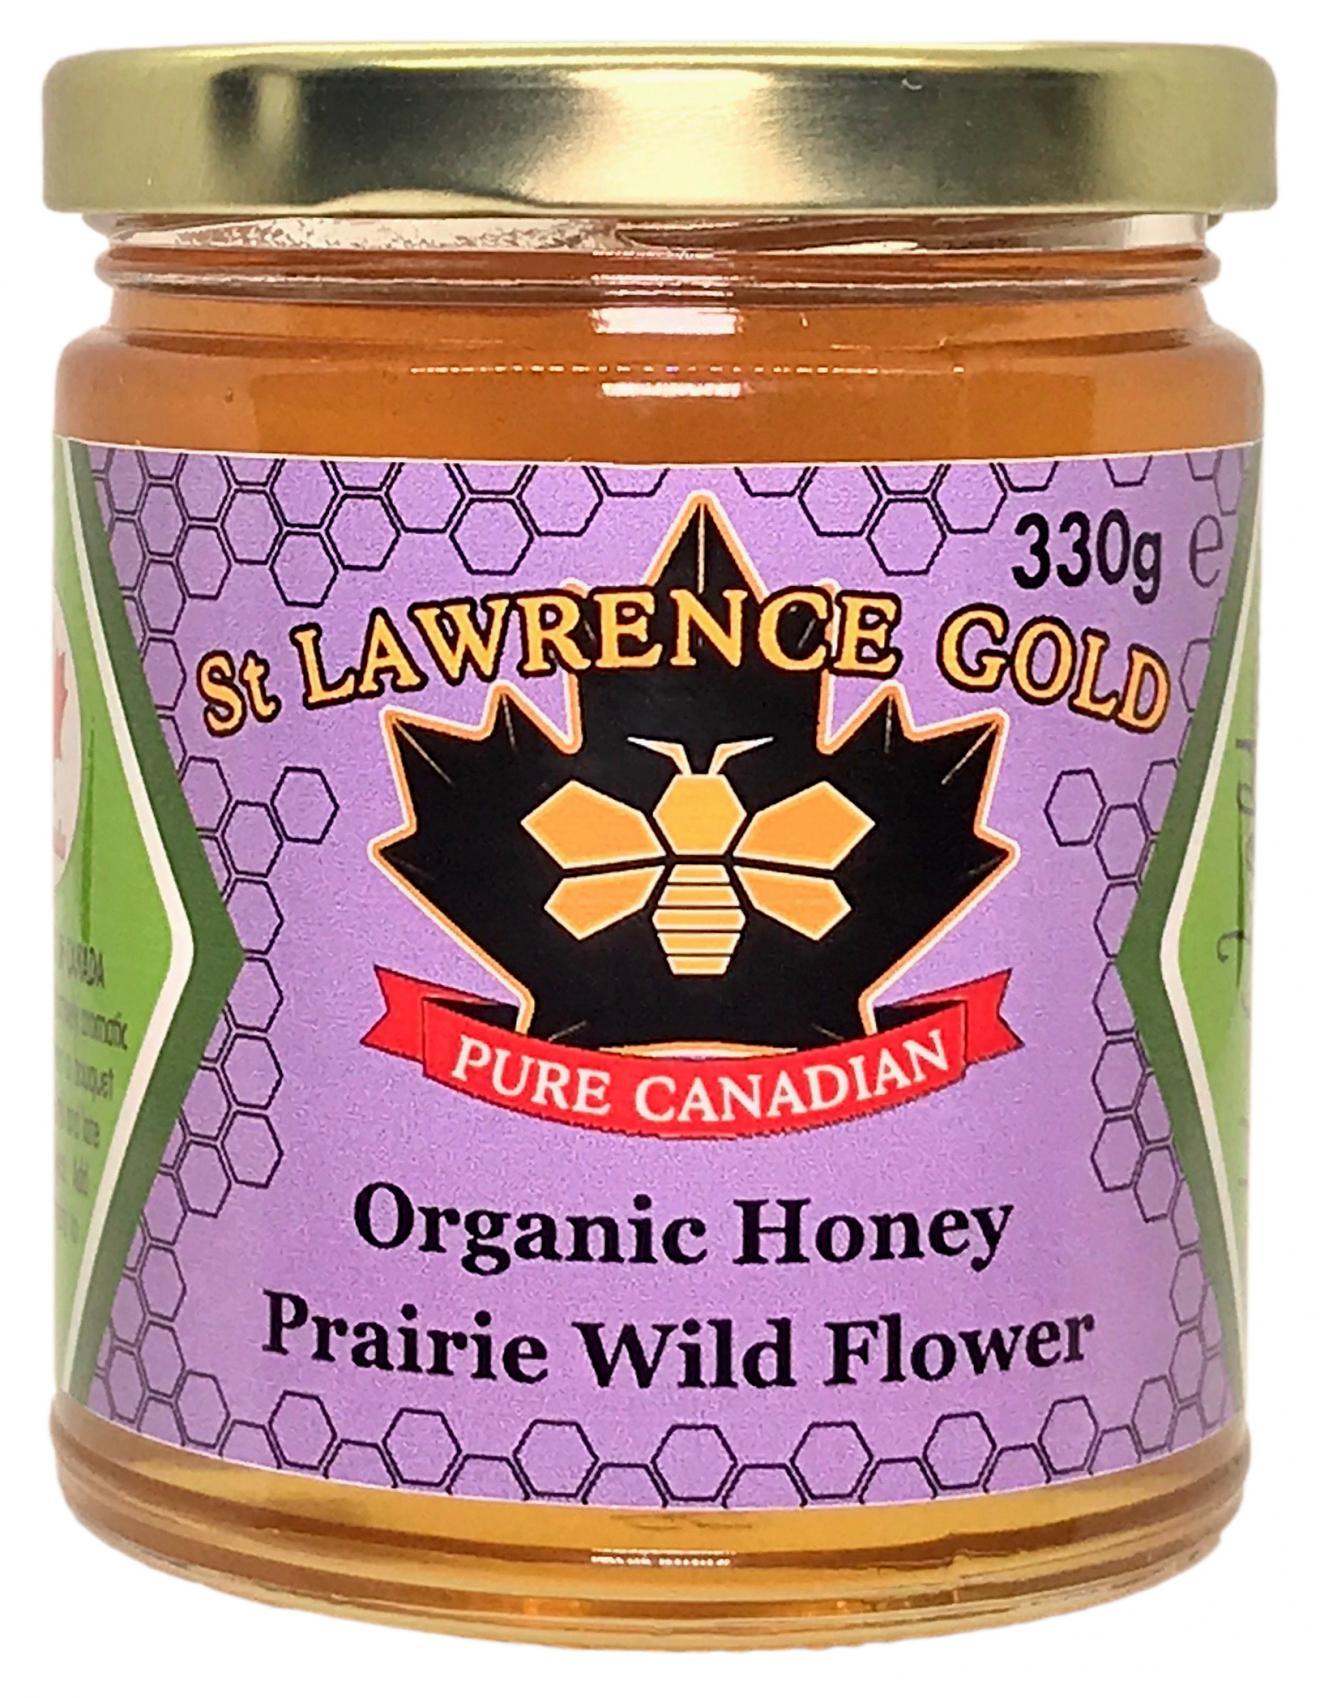 Pure Canadian - Organic Honey Prairie Wild Flower 330g